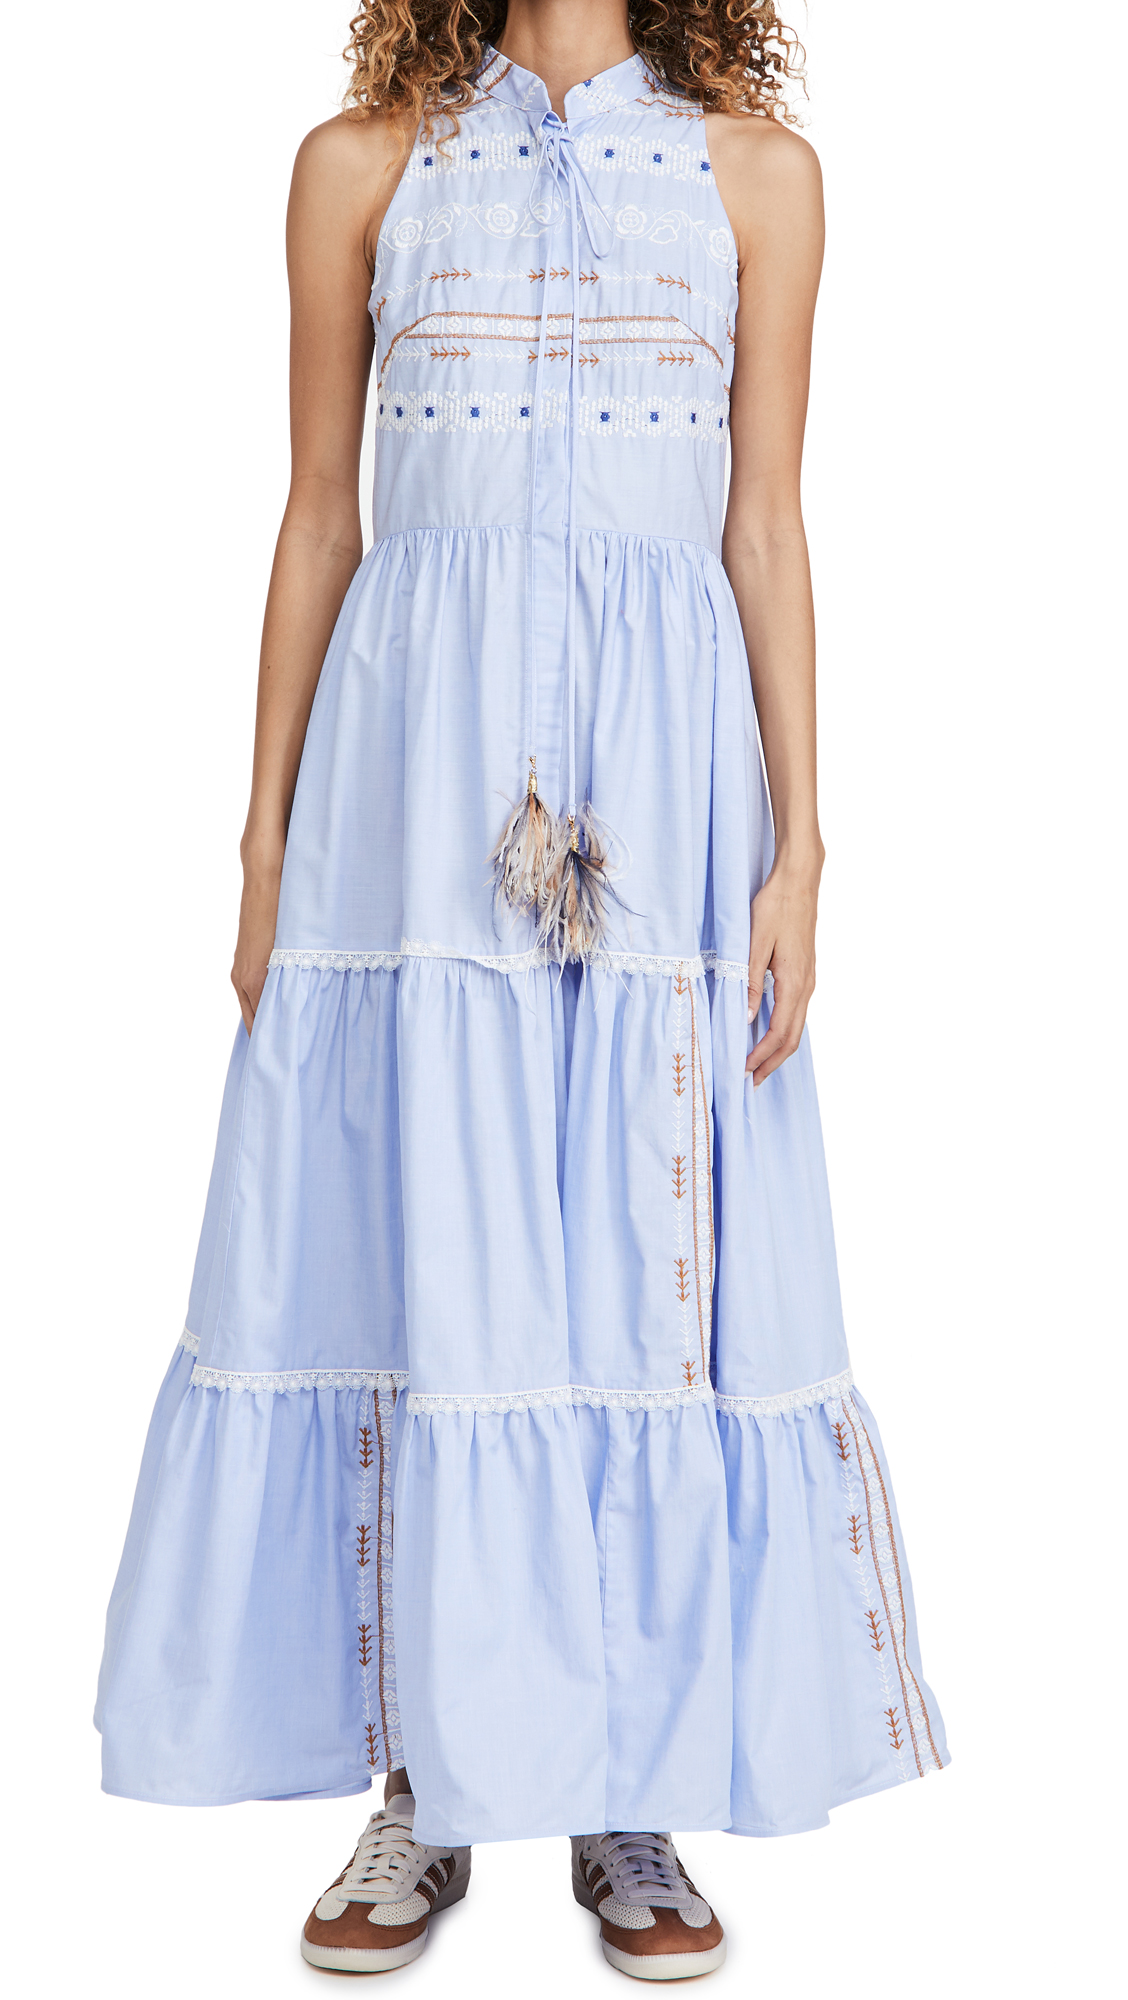 Silvia Tcherassi Aviaton Dress